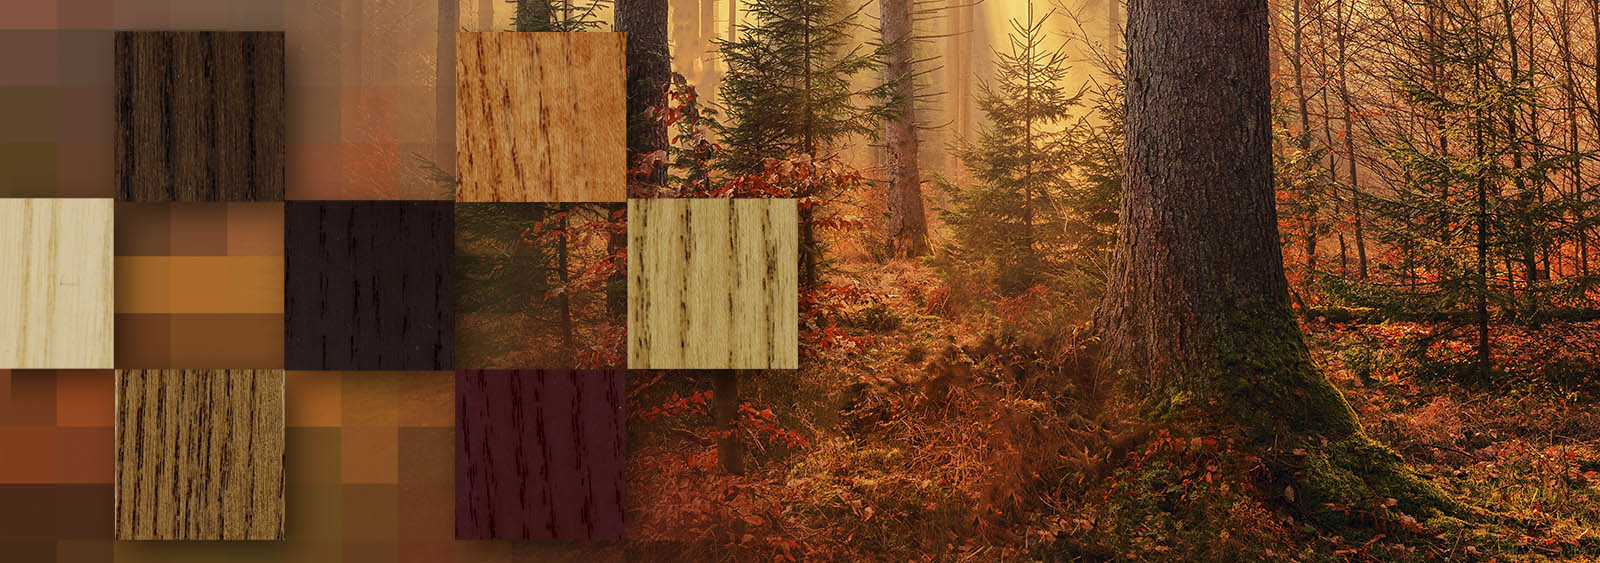 colores otoño protectores al agua